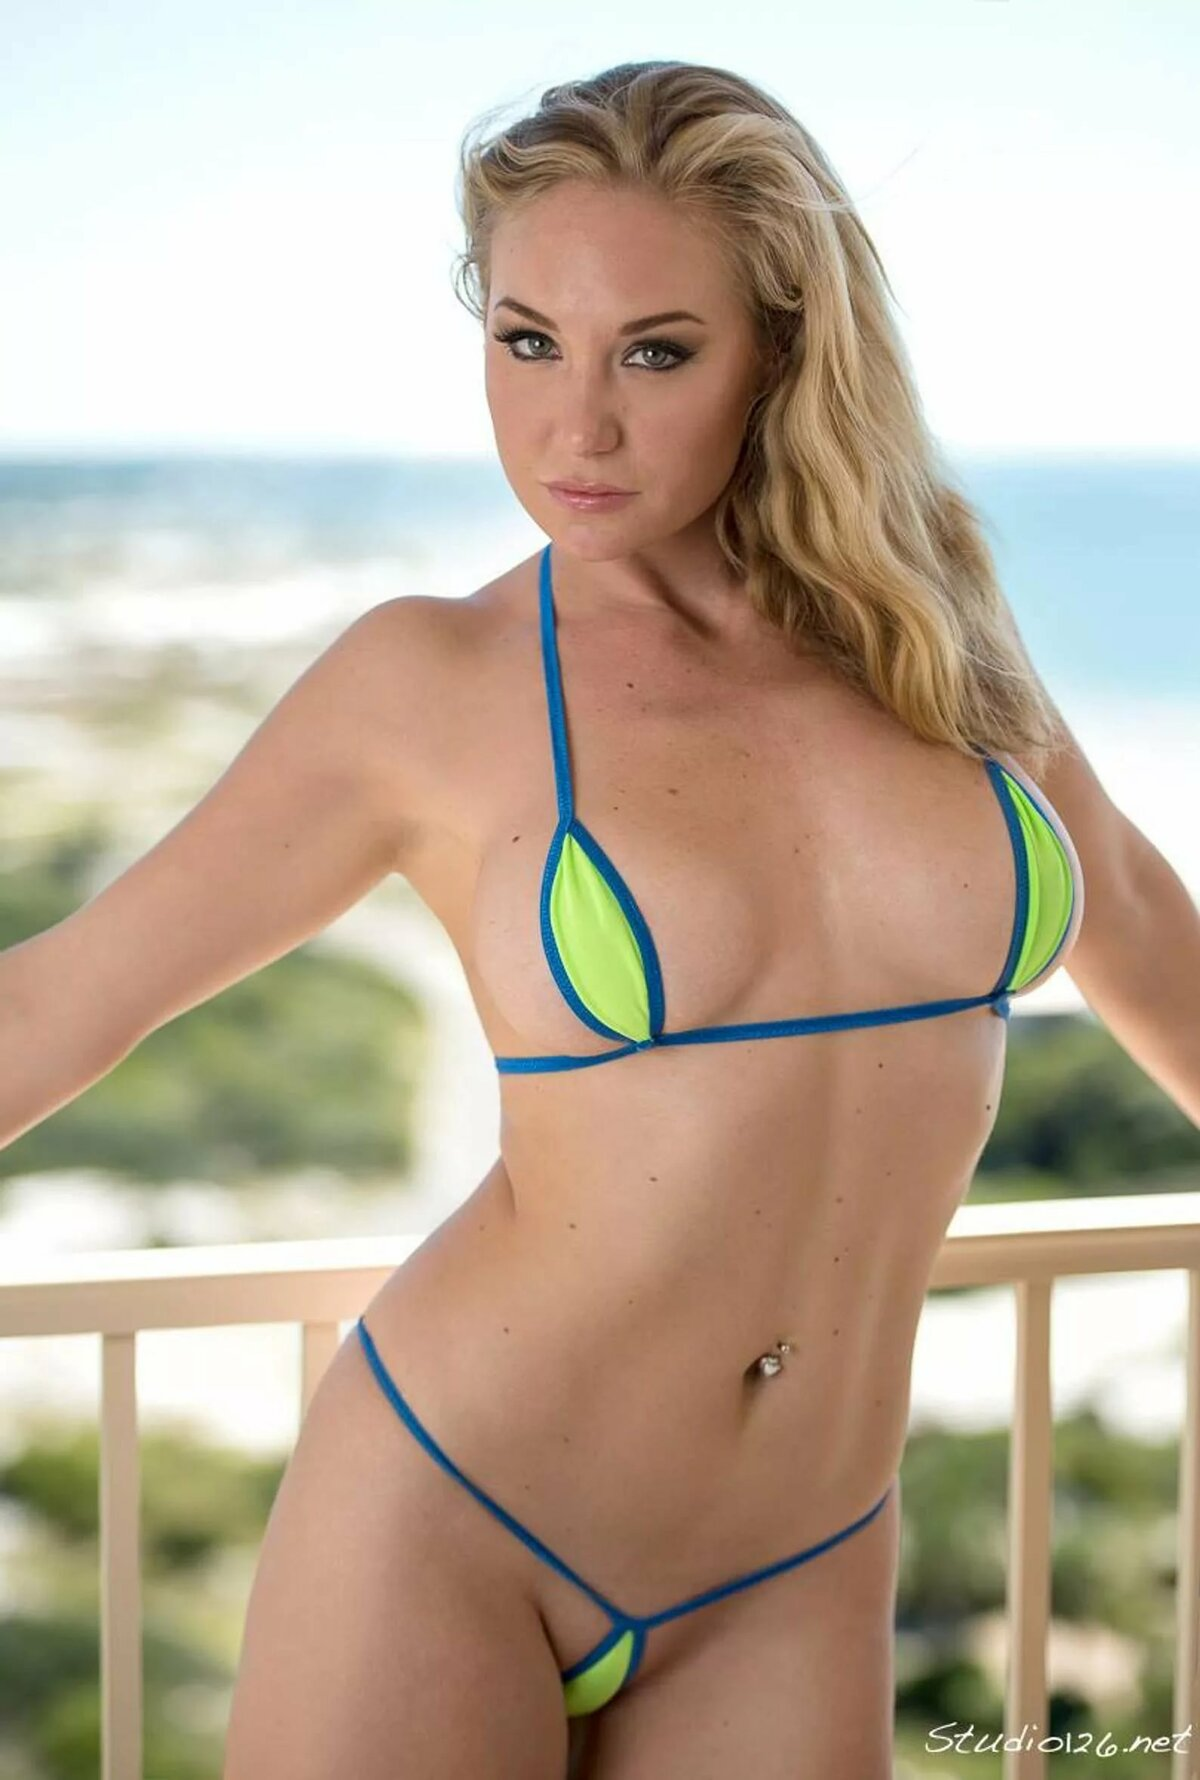 Hot thong bikini girl